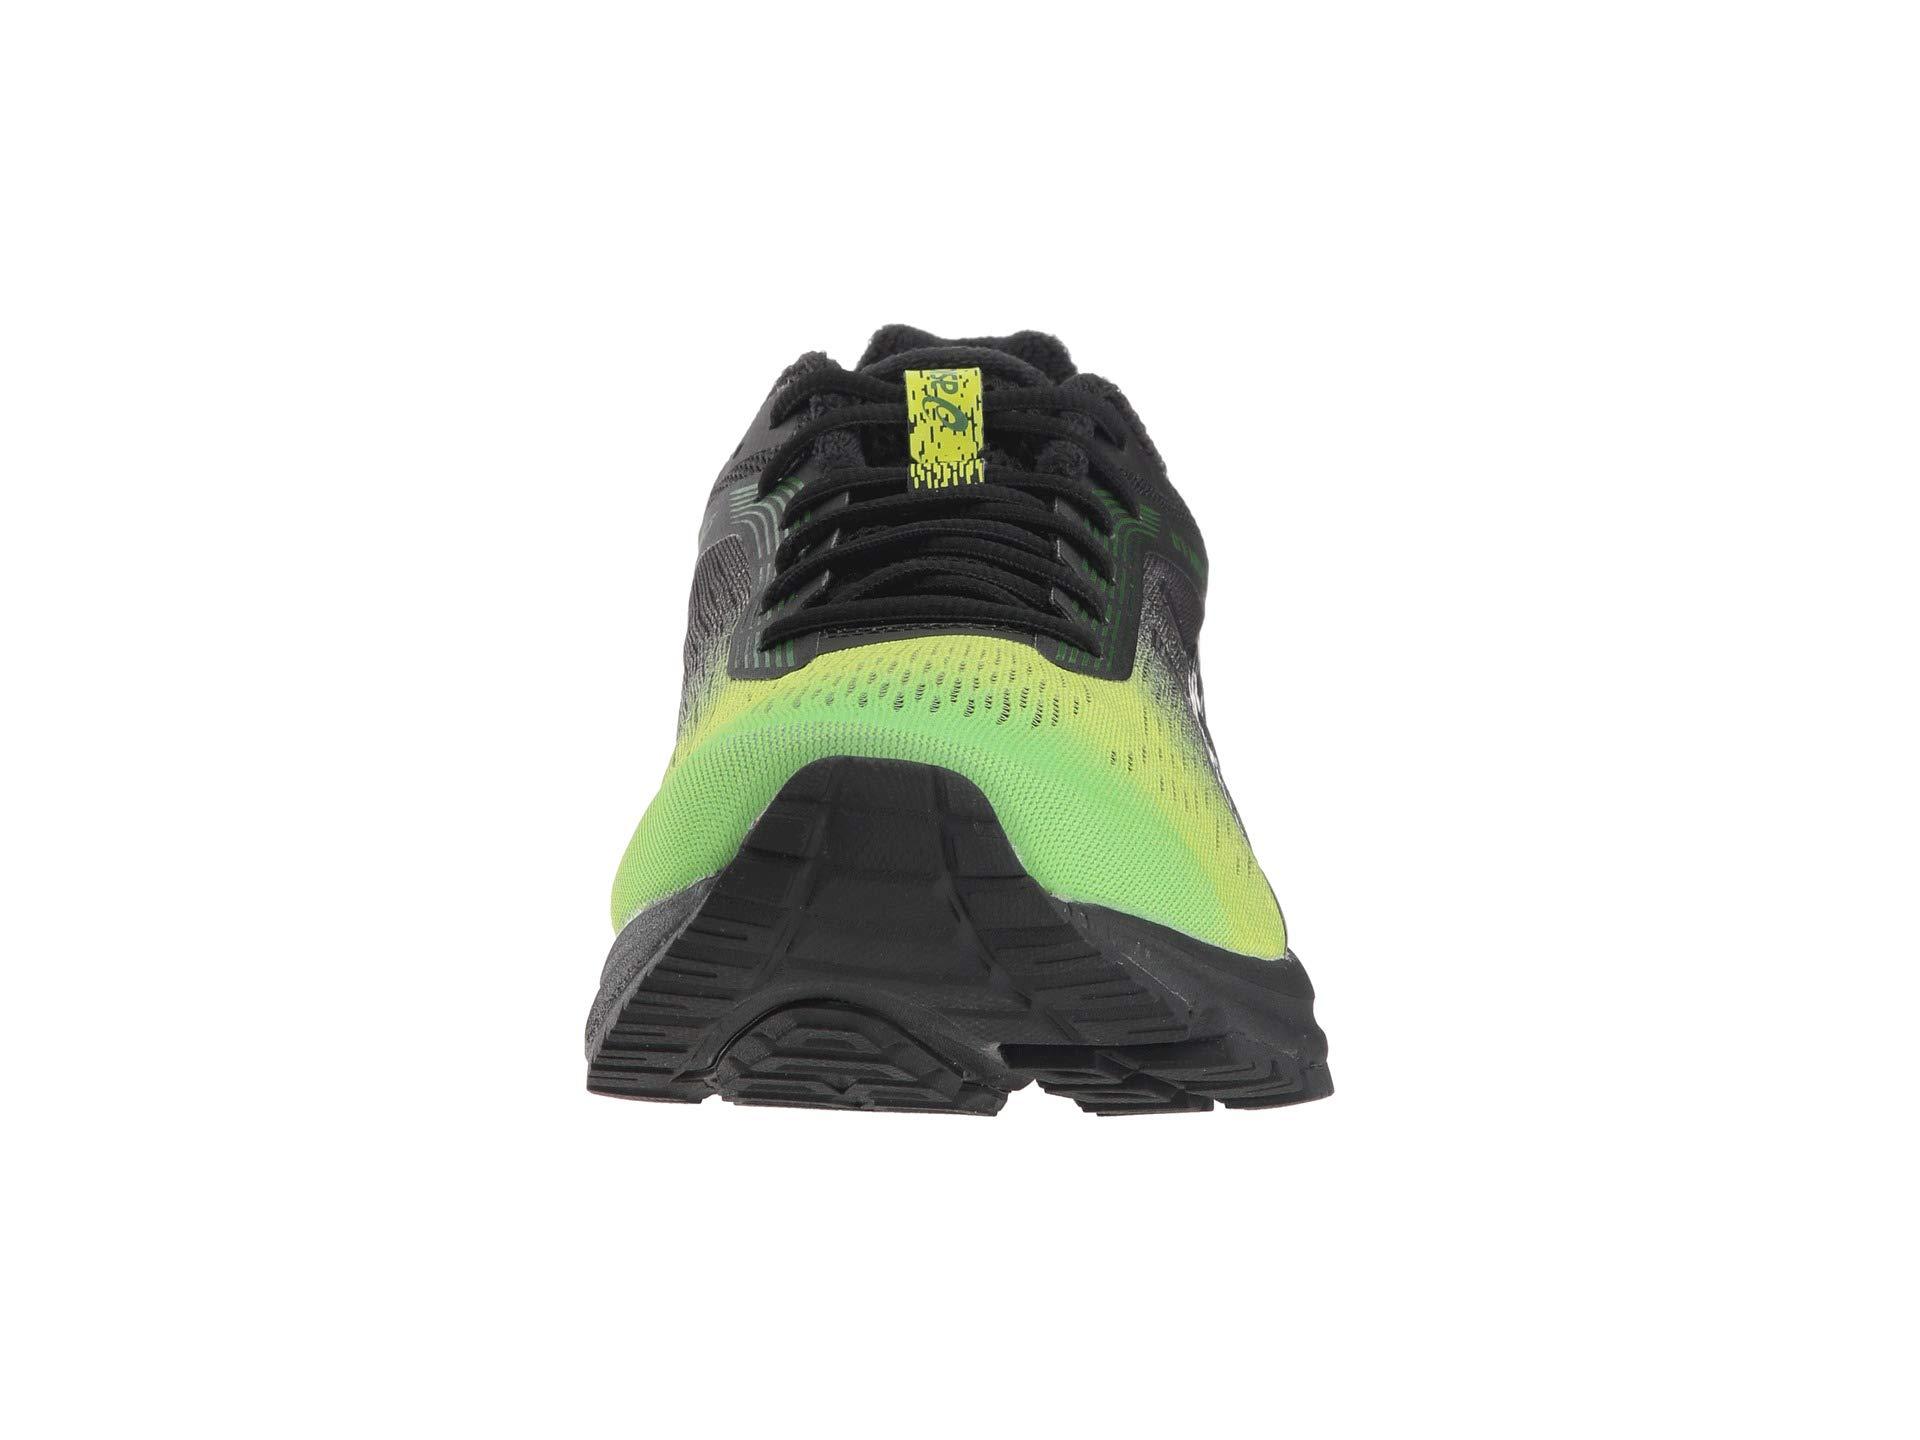 Neon Gt 7 Sp Lime 1000 Asics black Avwqg7U